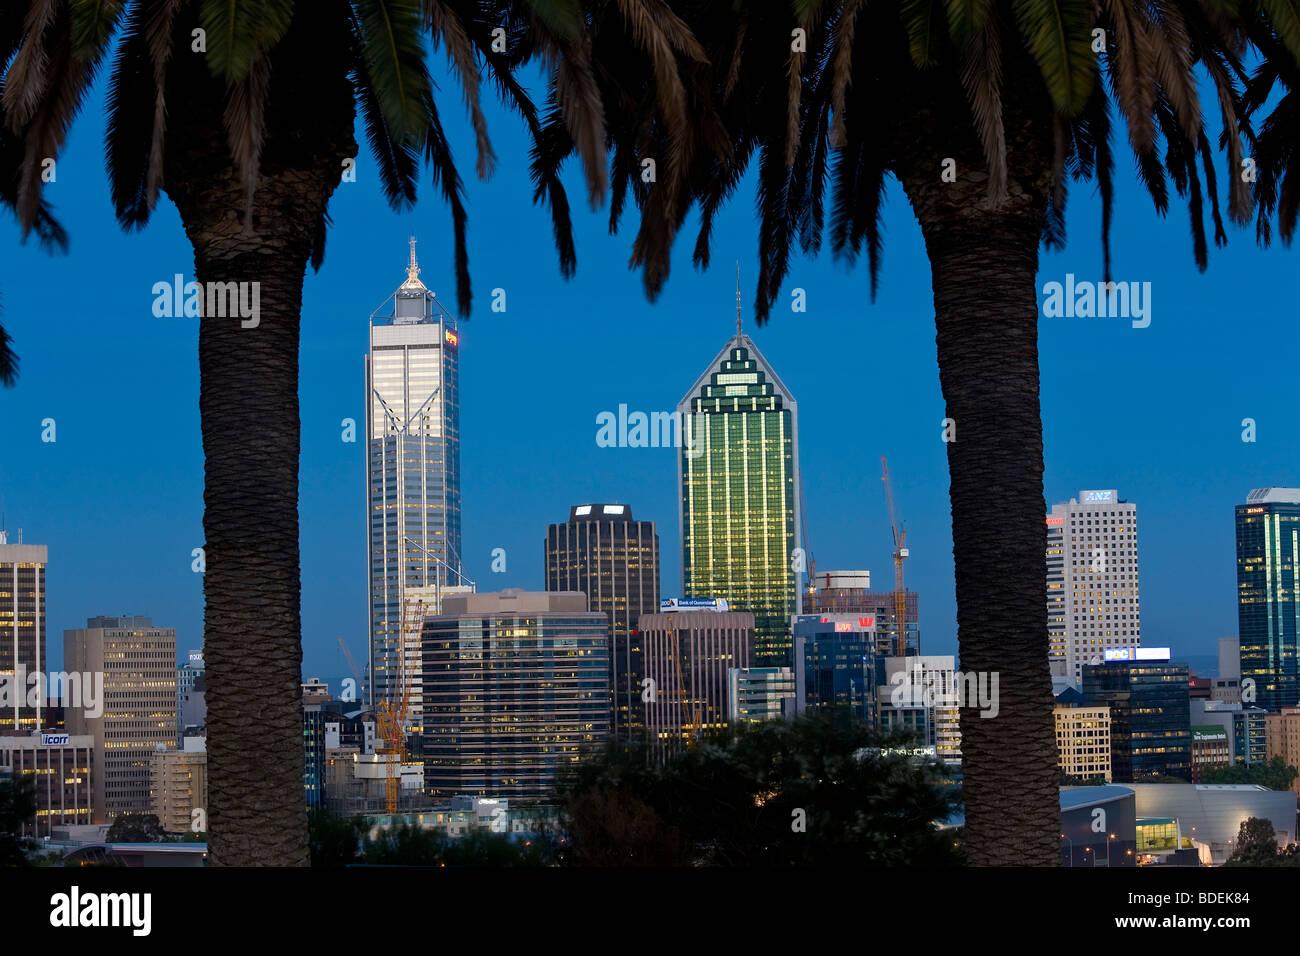 View of the Perth CBD skyline from Kings Park, Western Australia, Australia - Stock Image